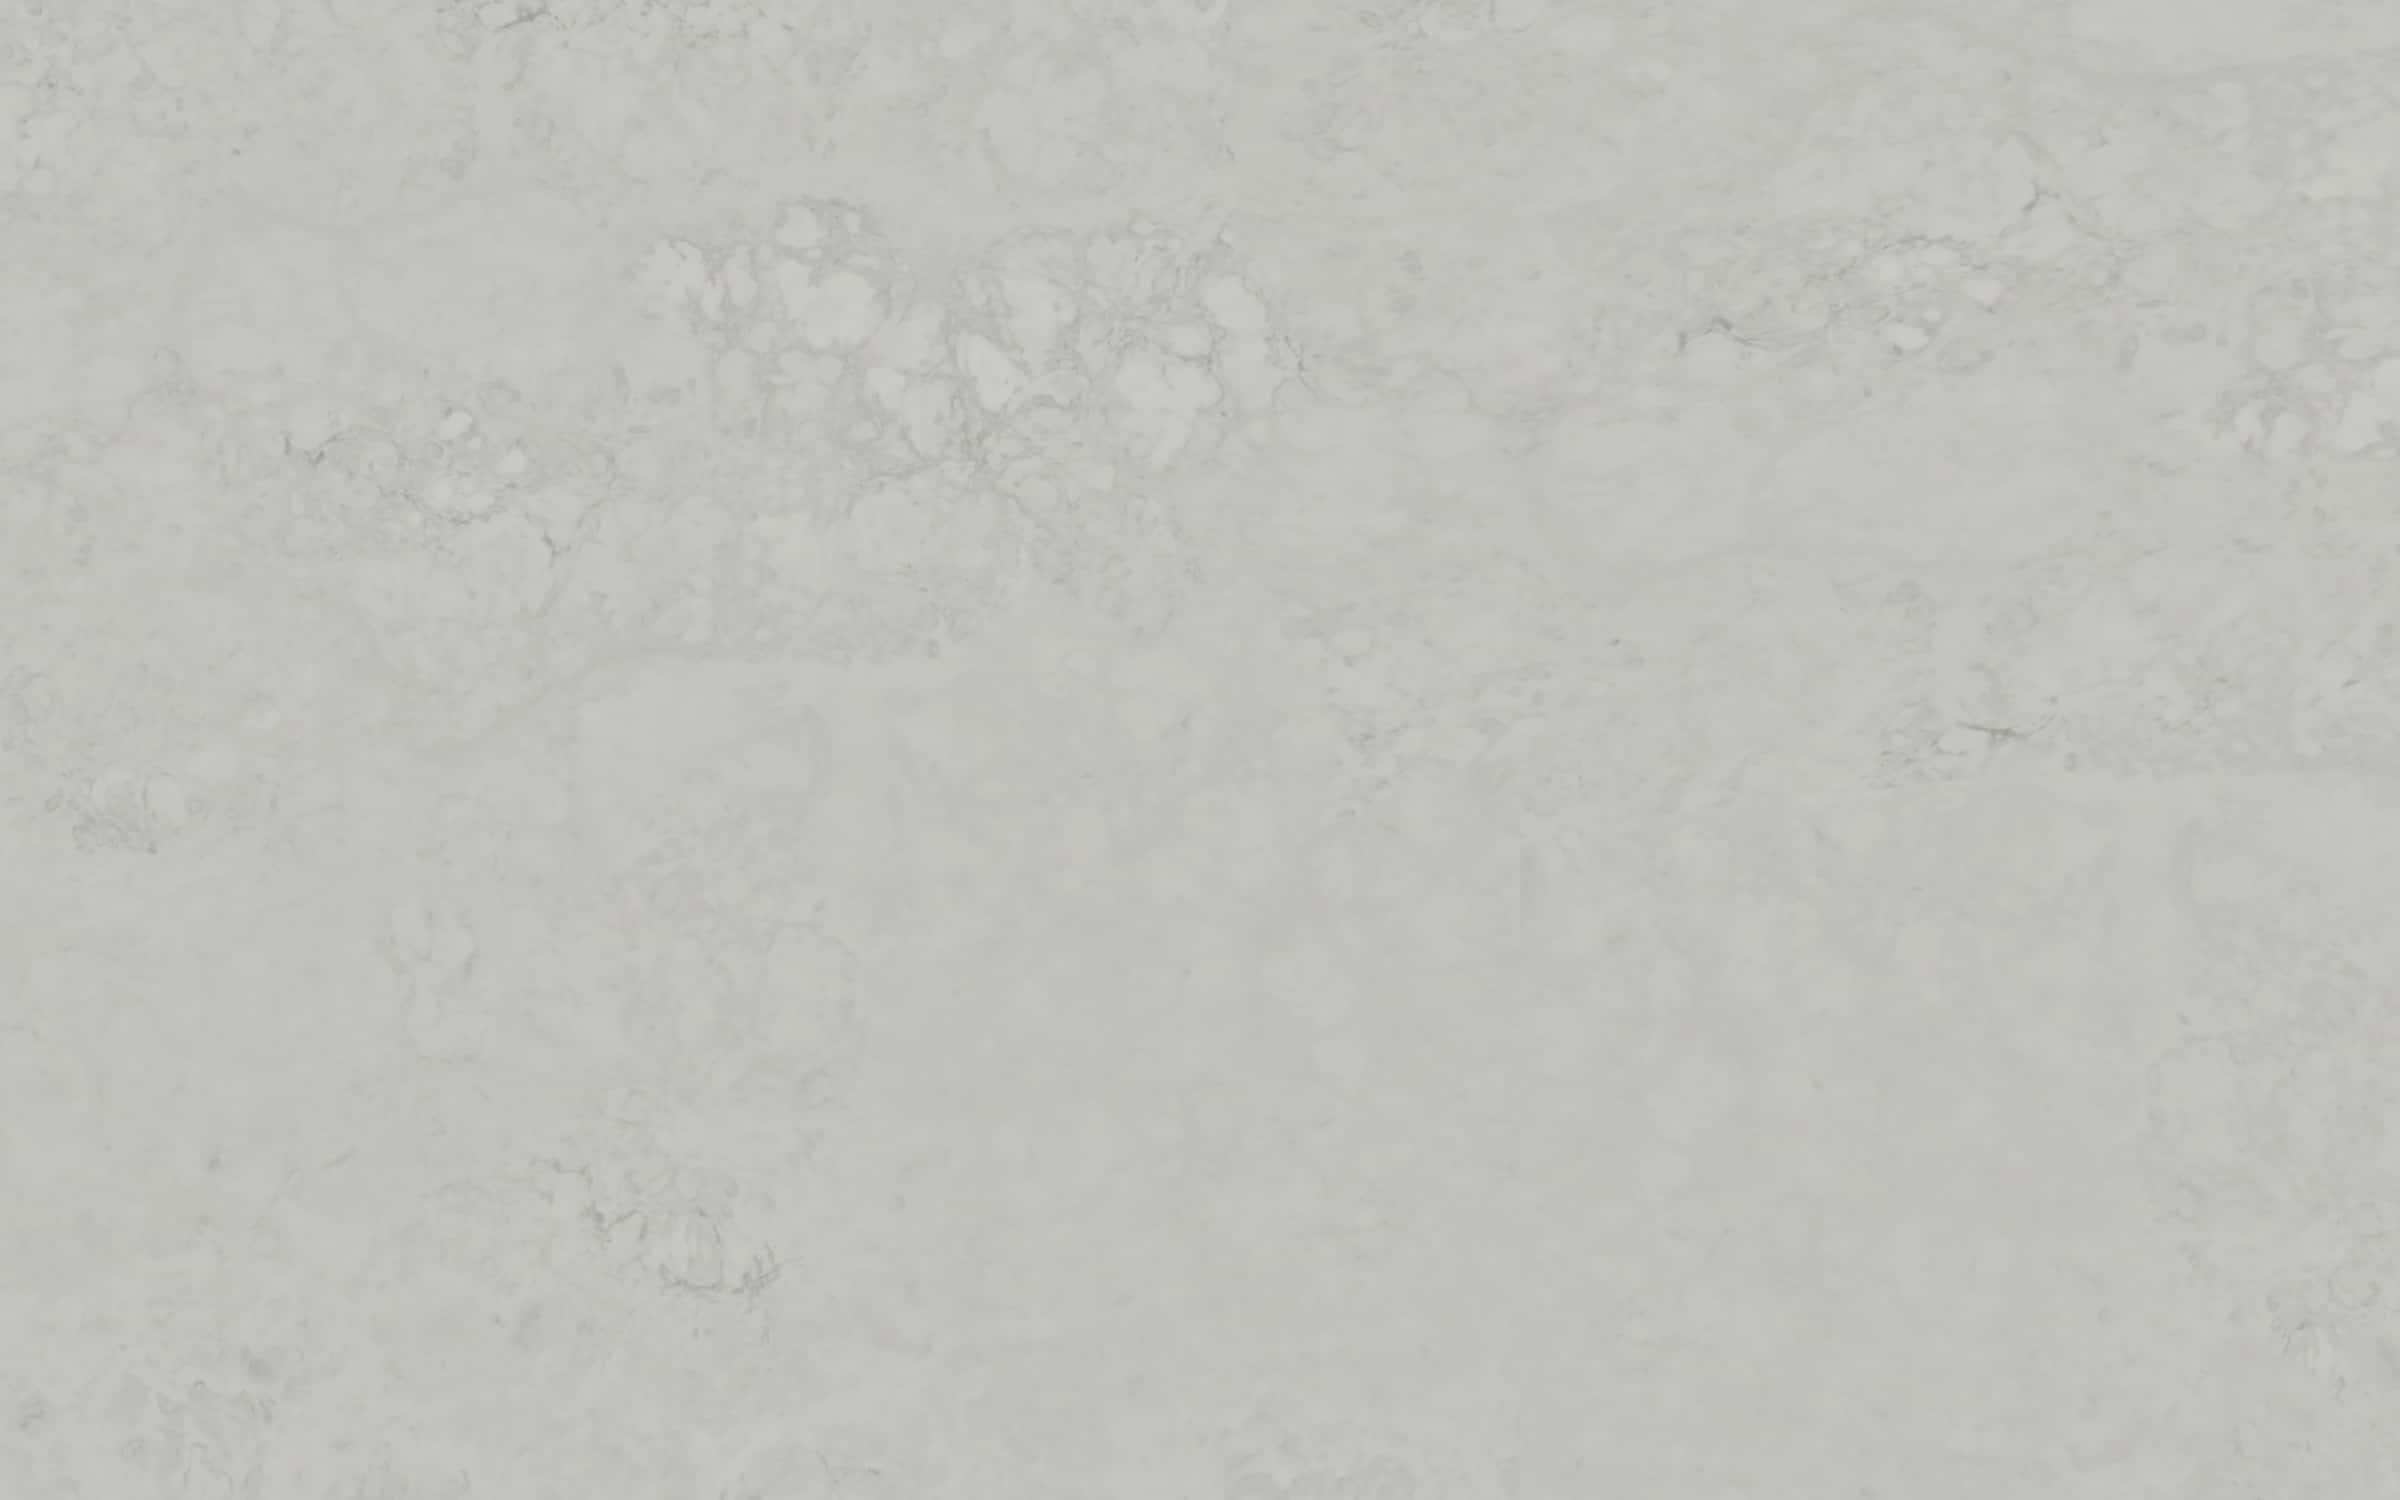 Marmo Bianco - Veined Apollo Slab